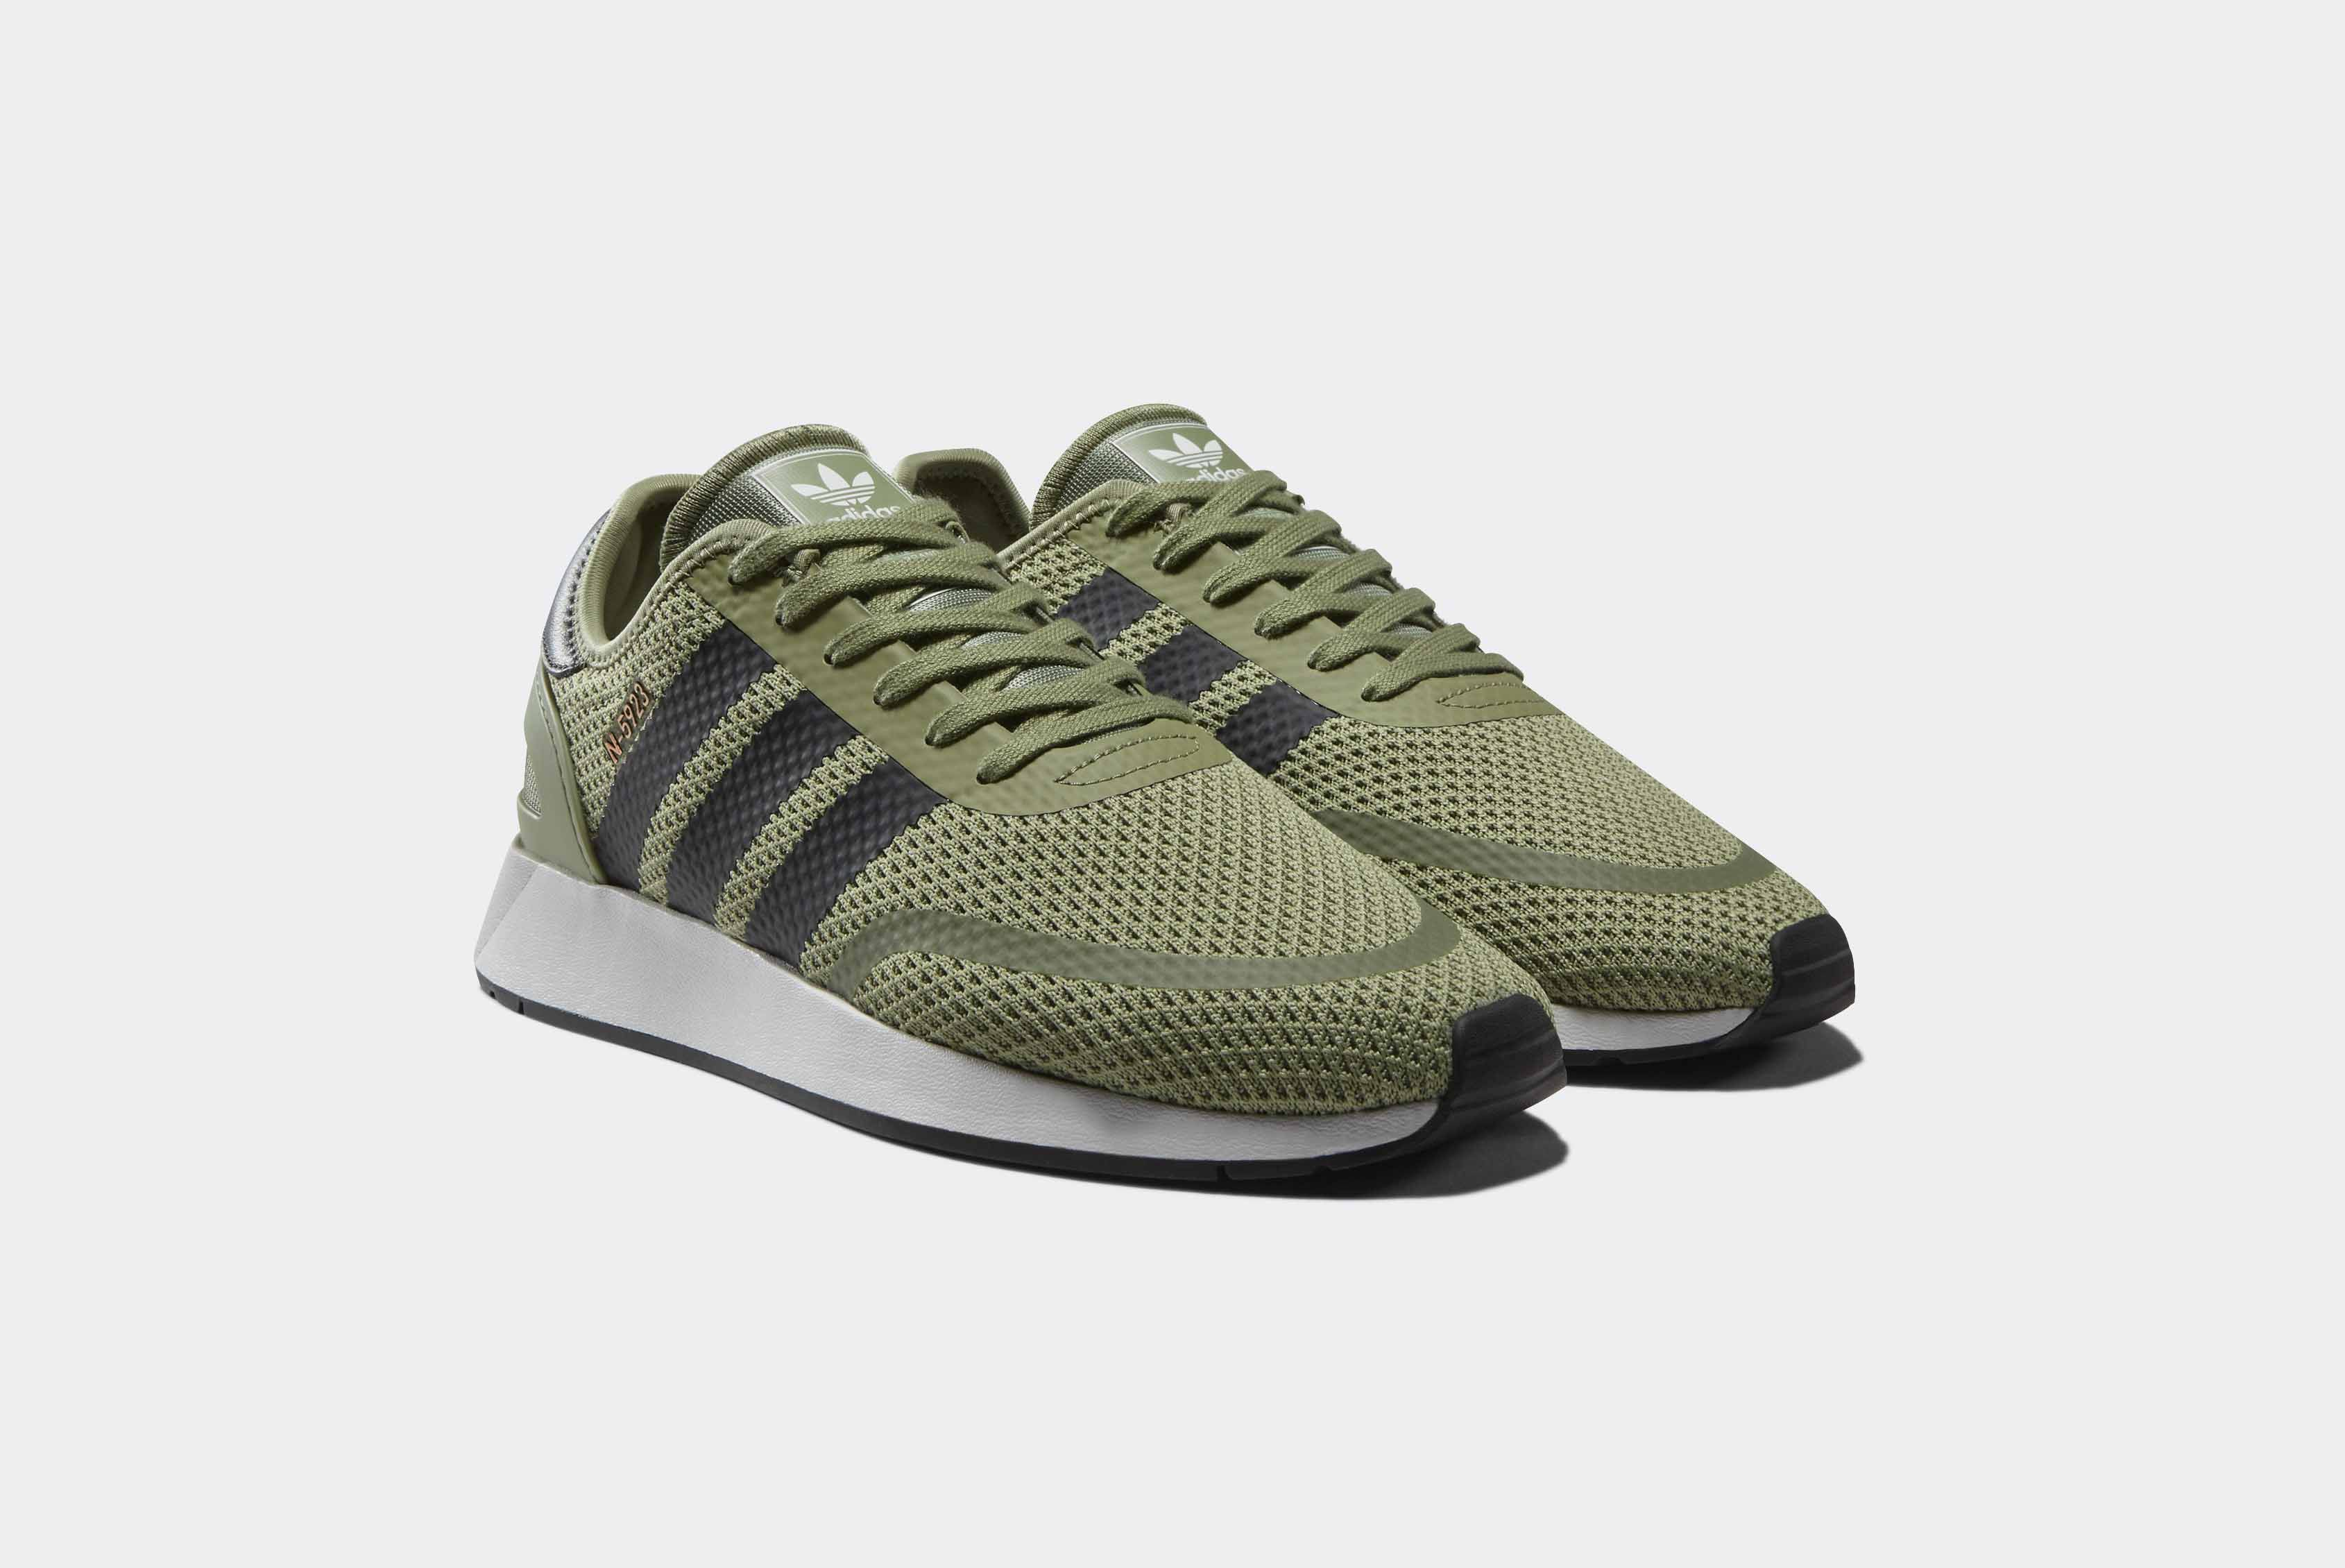 Adidas N 5923 7 E1521479325920 Sneaker Freaker